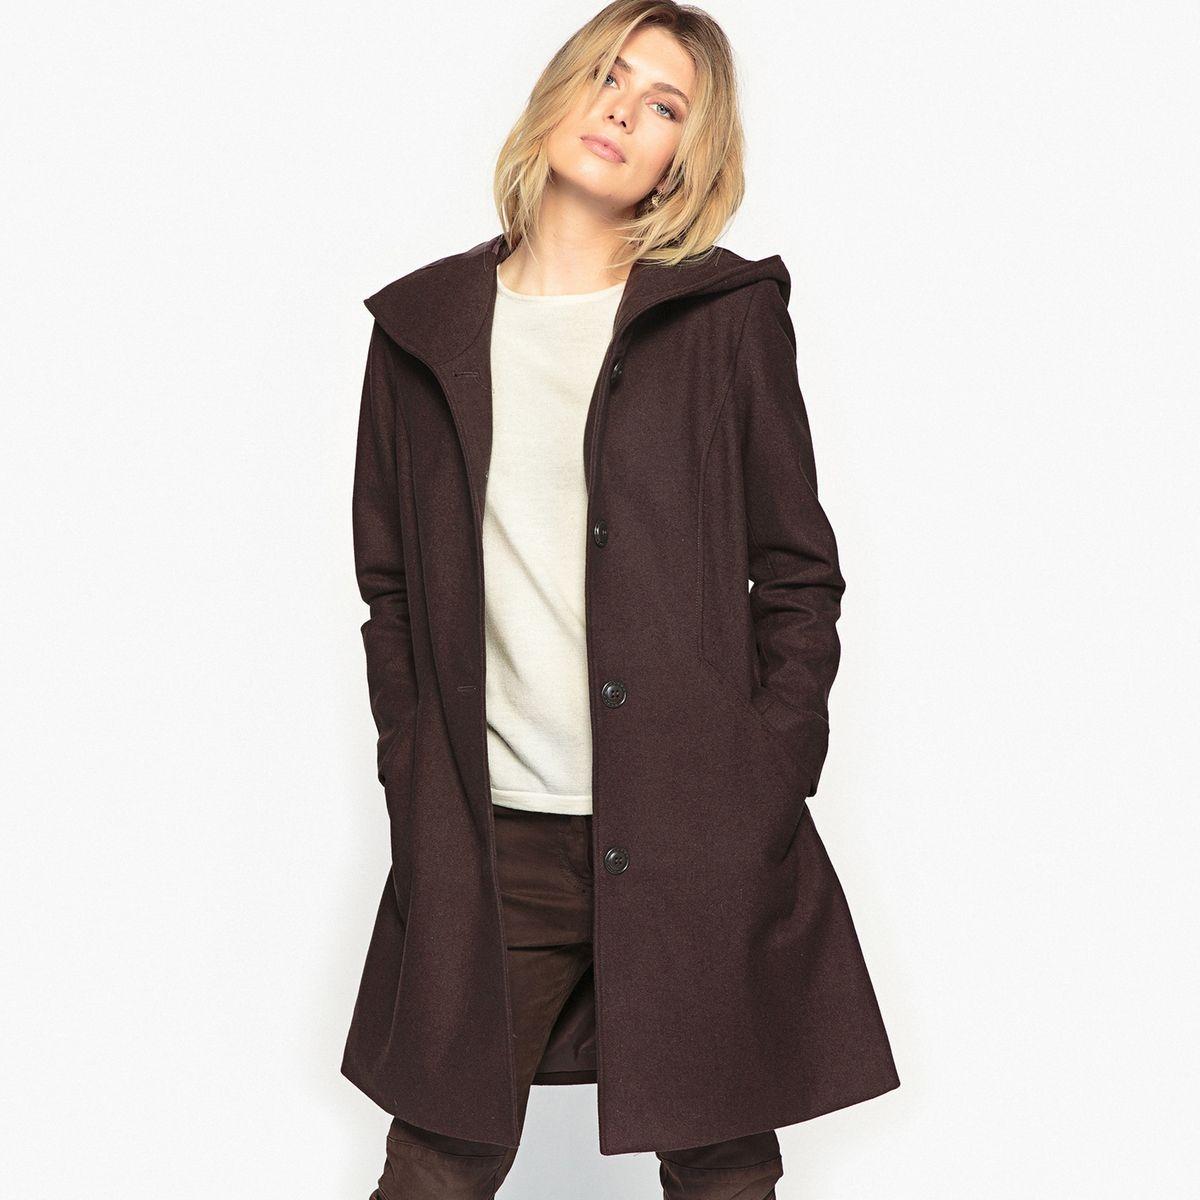 Duffle coat à capuche marron